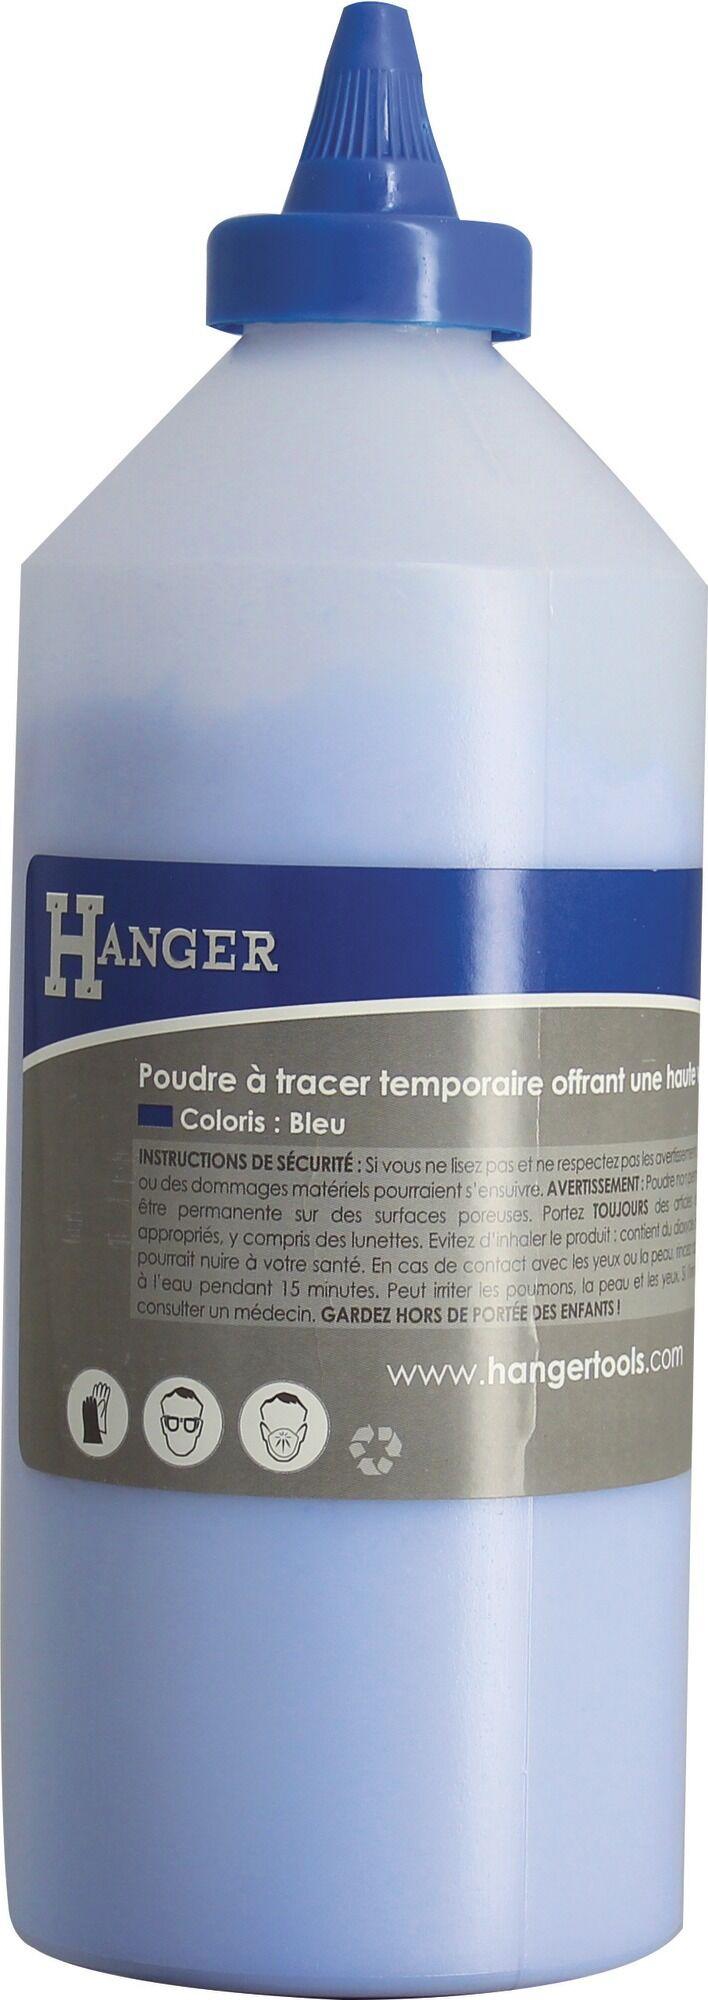 HANGER Poudre à tracer bleue 1 kg - HANGER - 100075